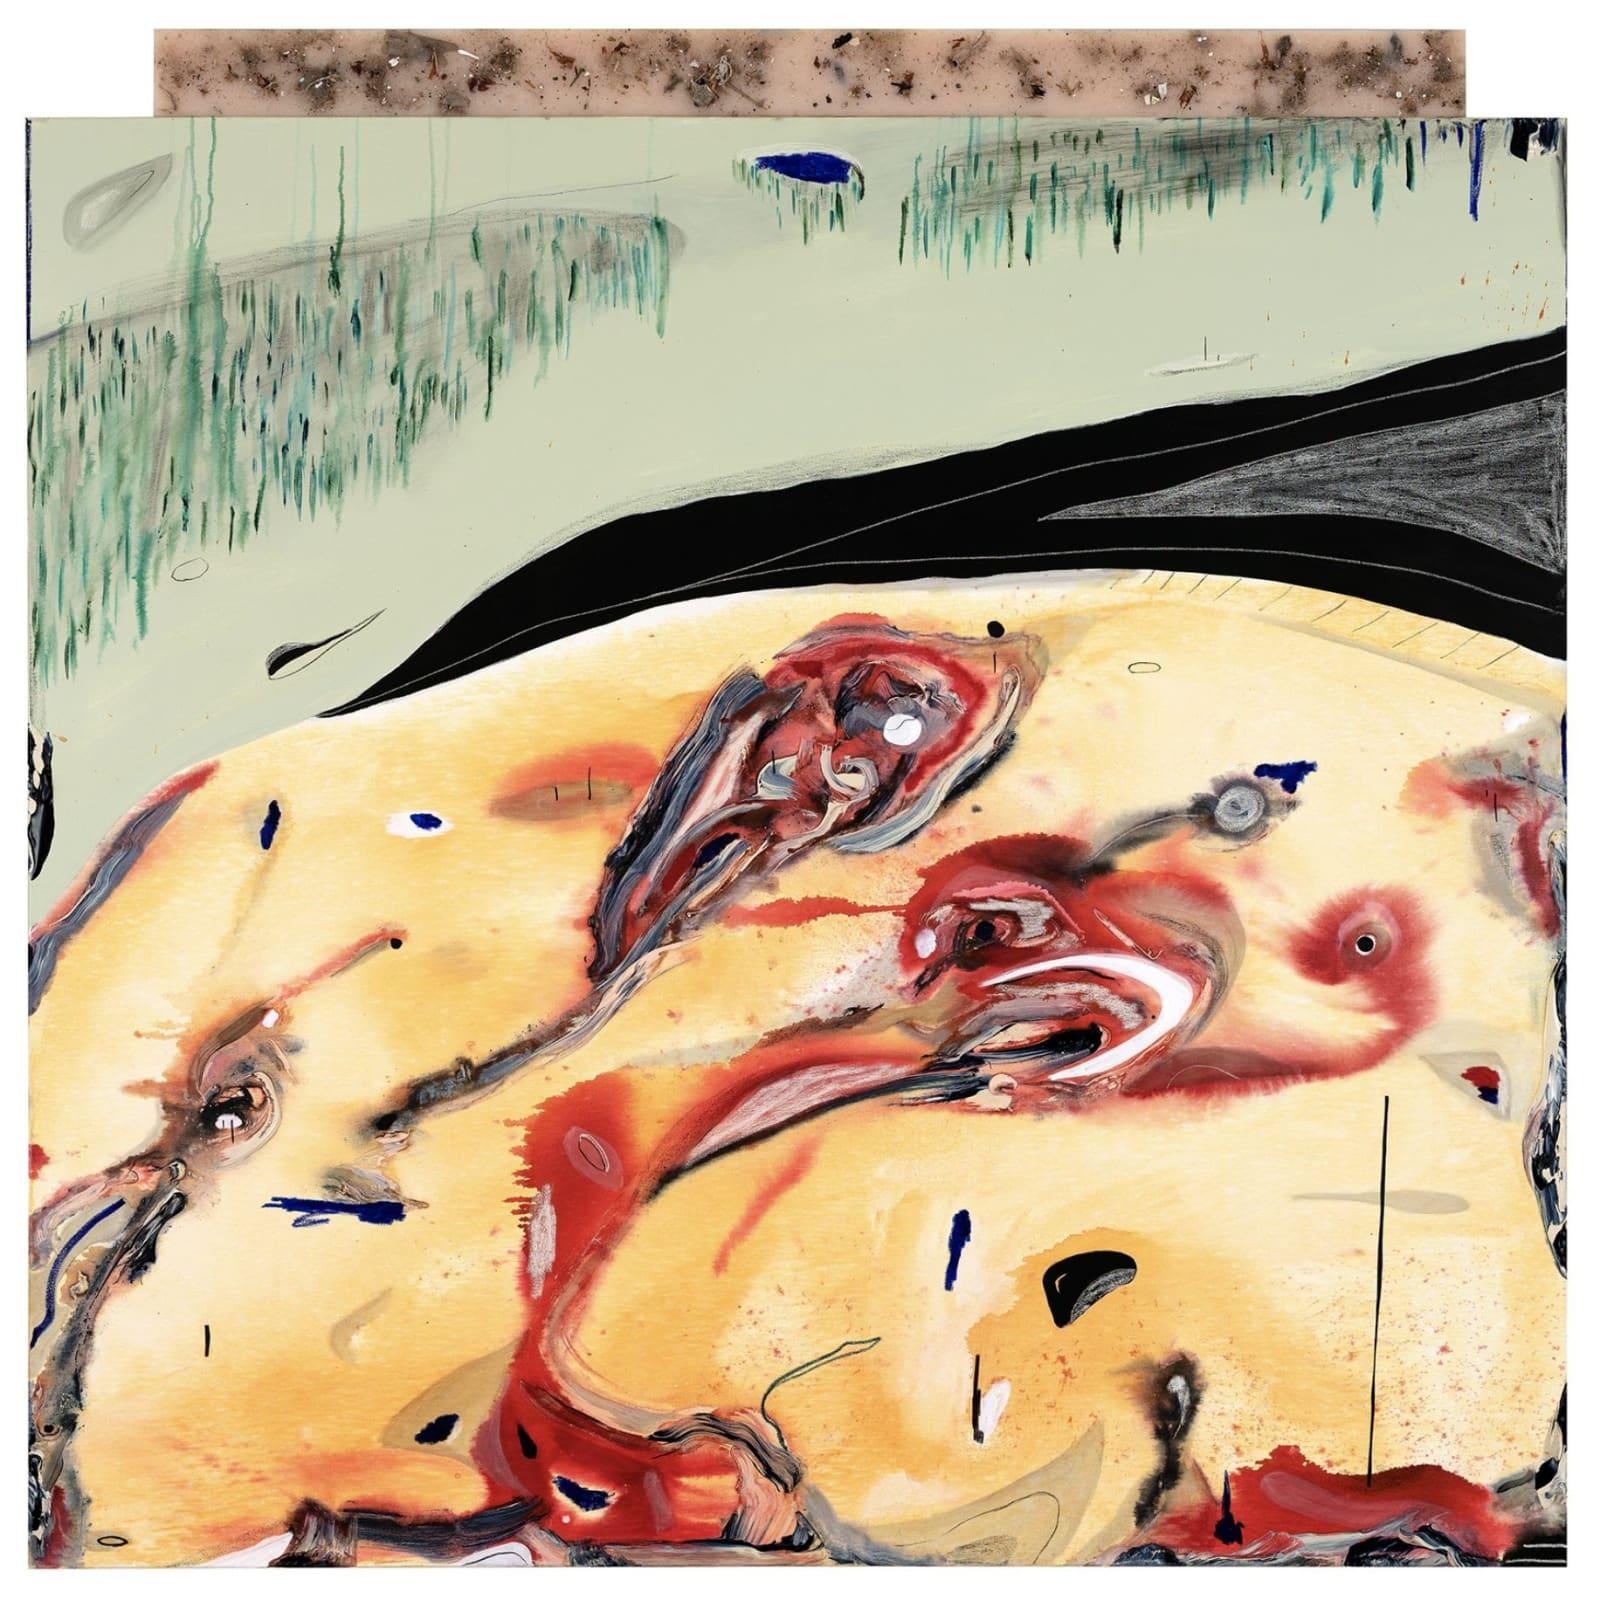 Imaginary Landscape, 2019, mixed media, 75 x 68 inches